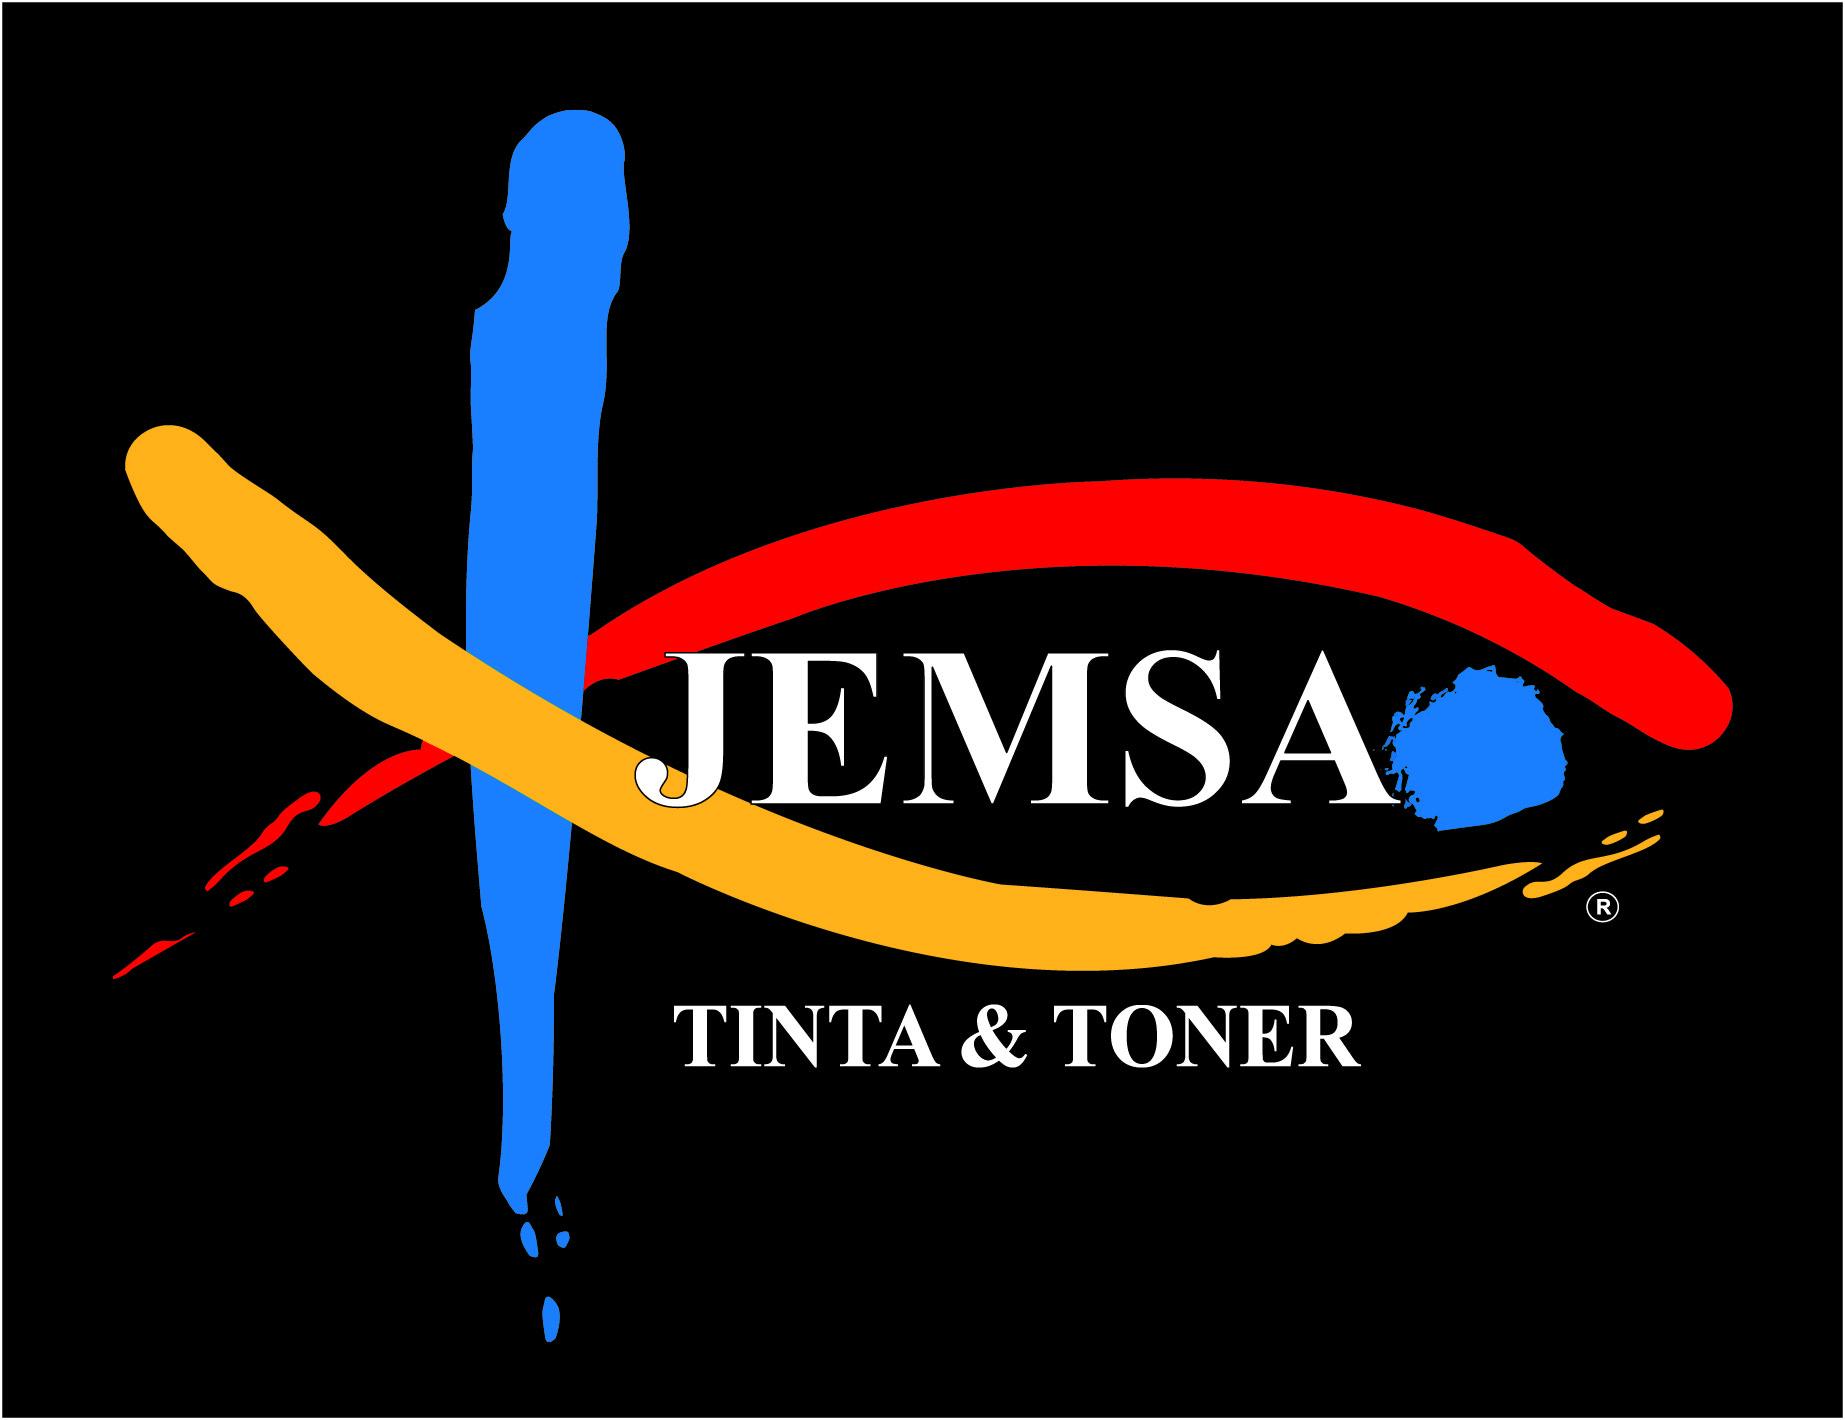 JEMSA TINTA Y TONER